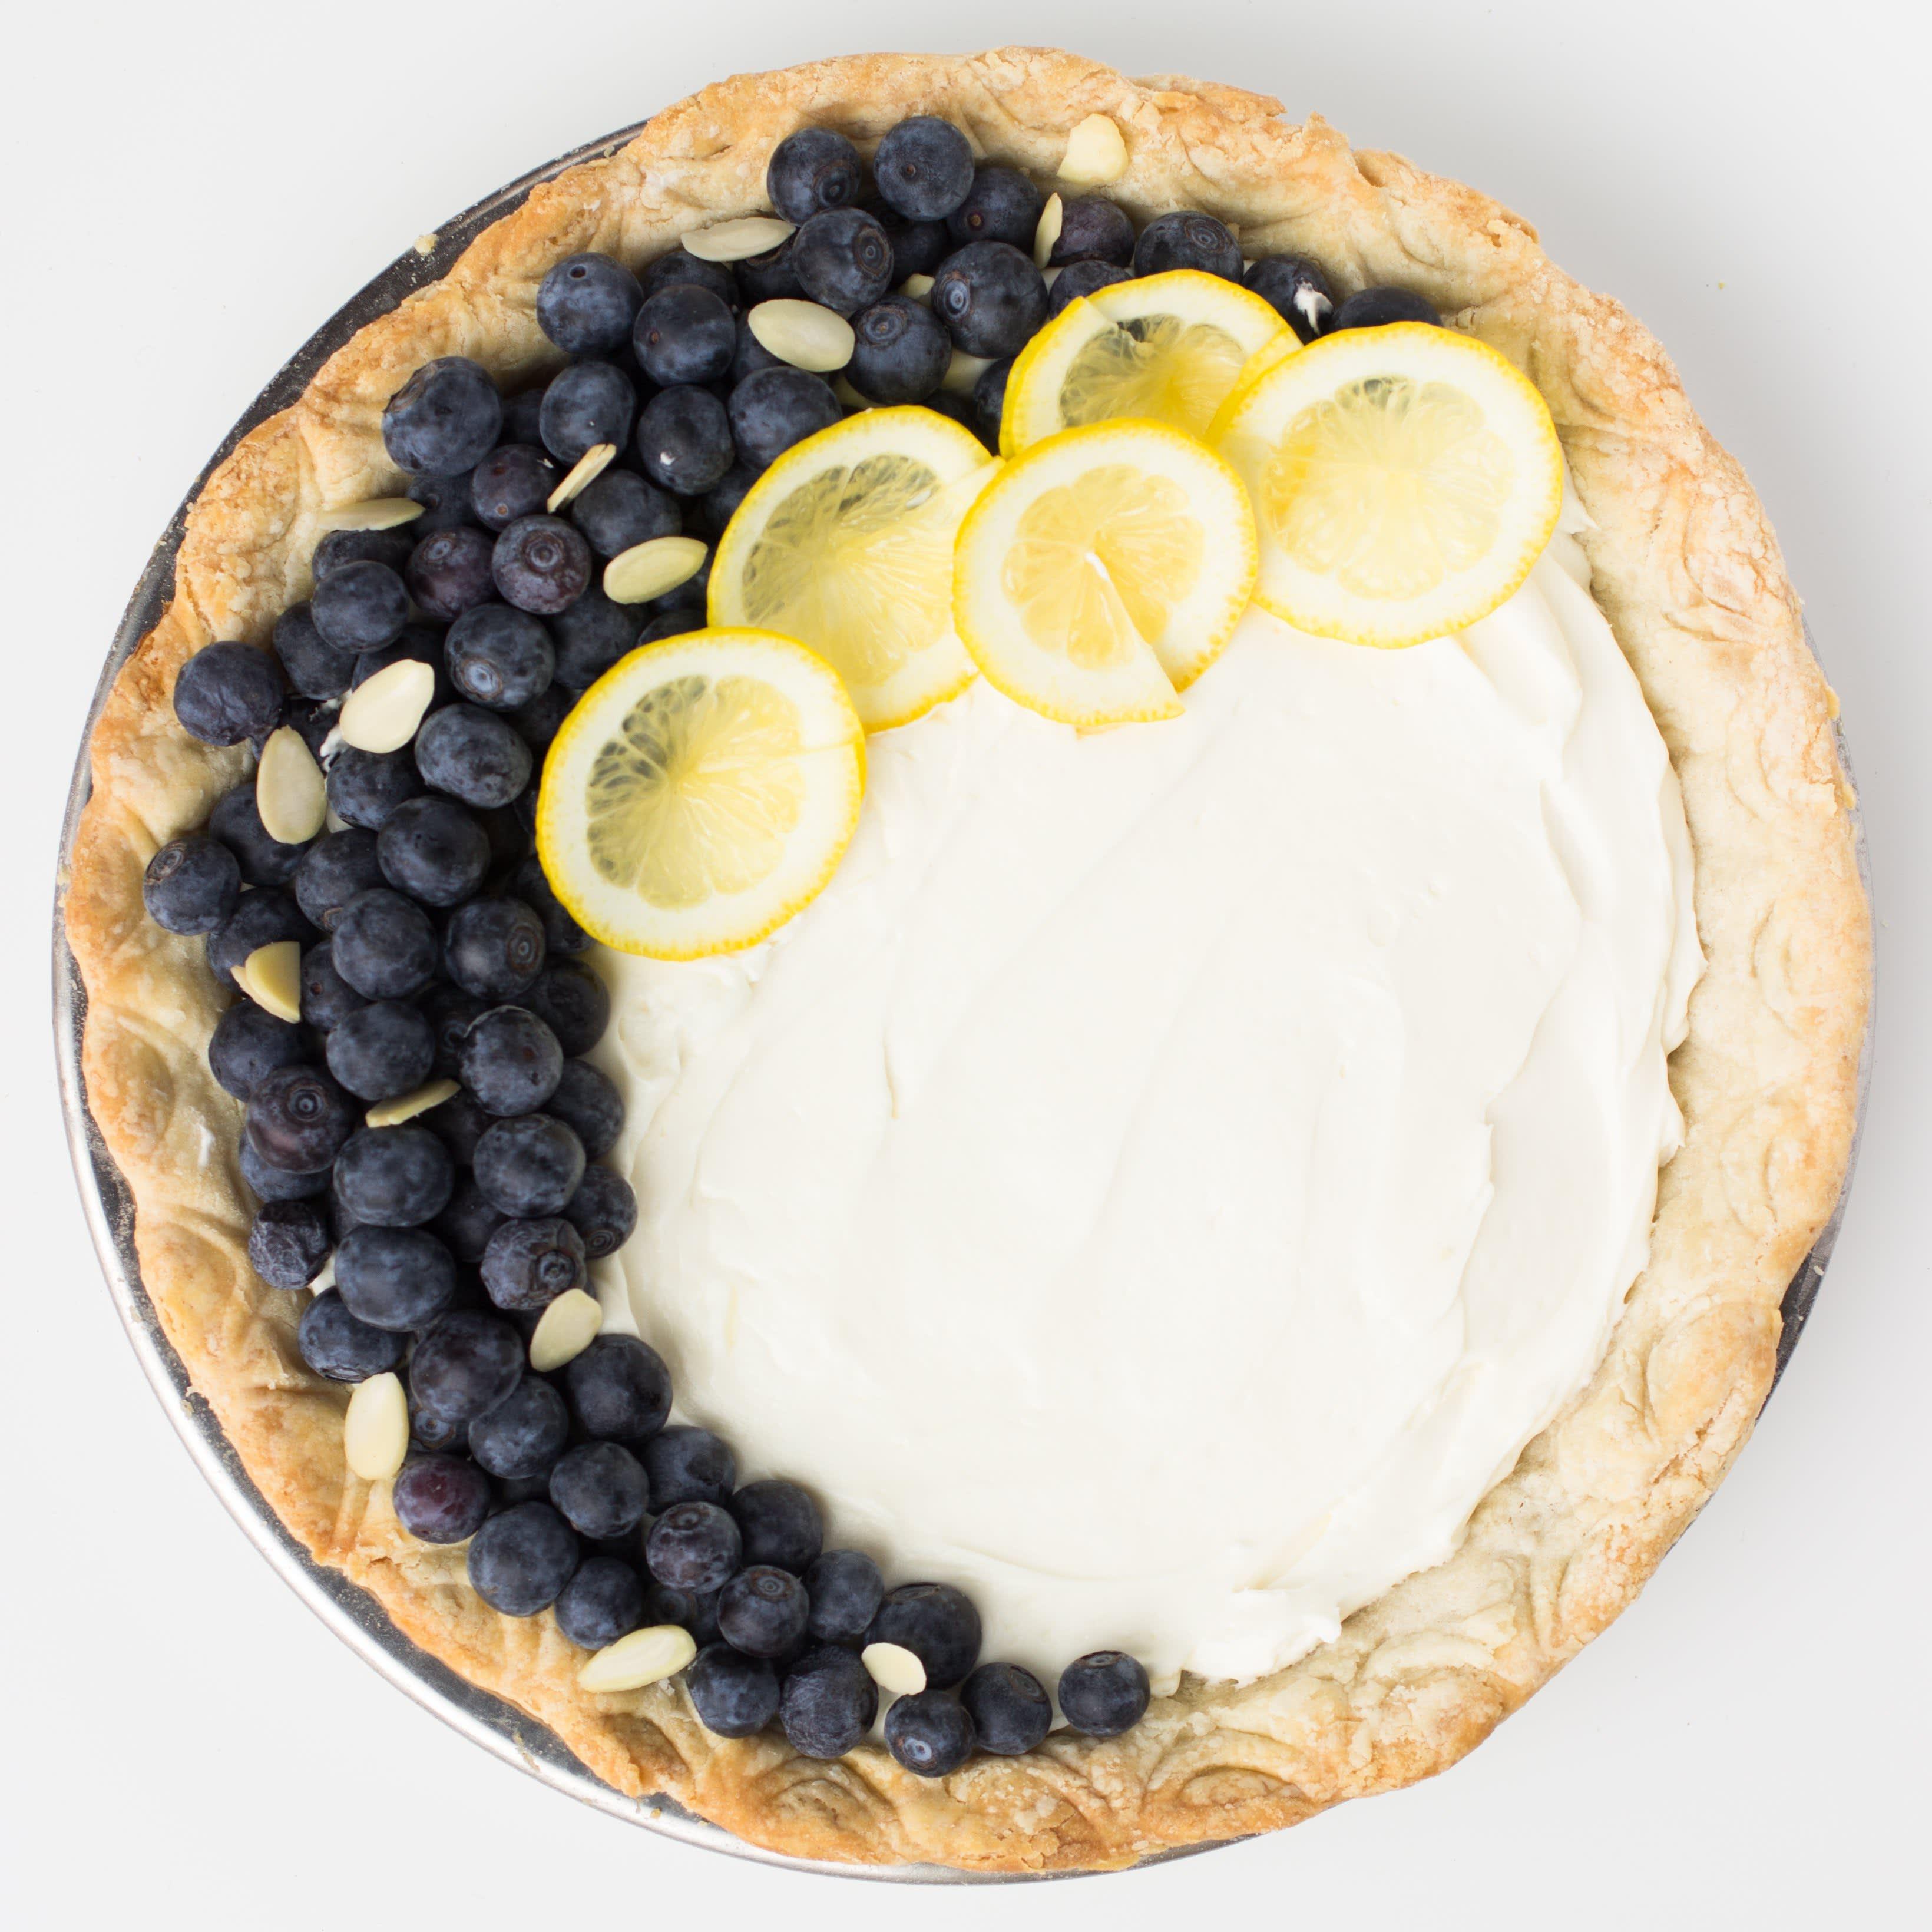 Spoon Crimp Pie Crust - How to Decorate a Pie